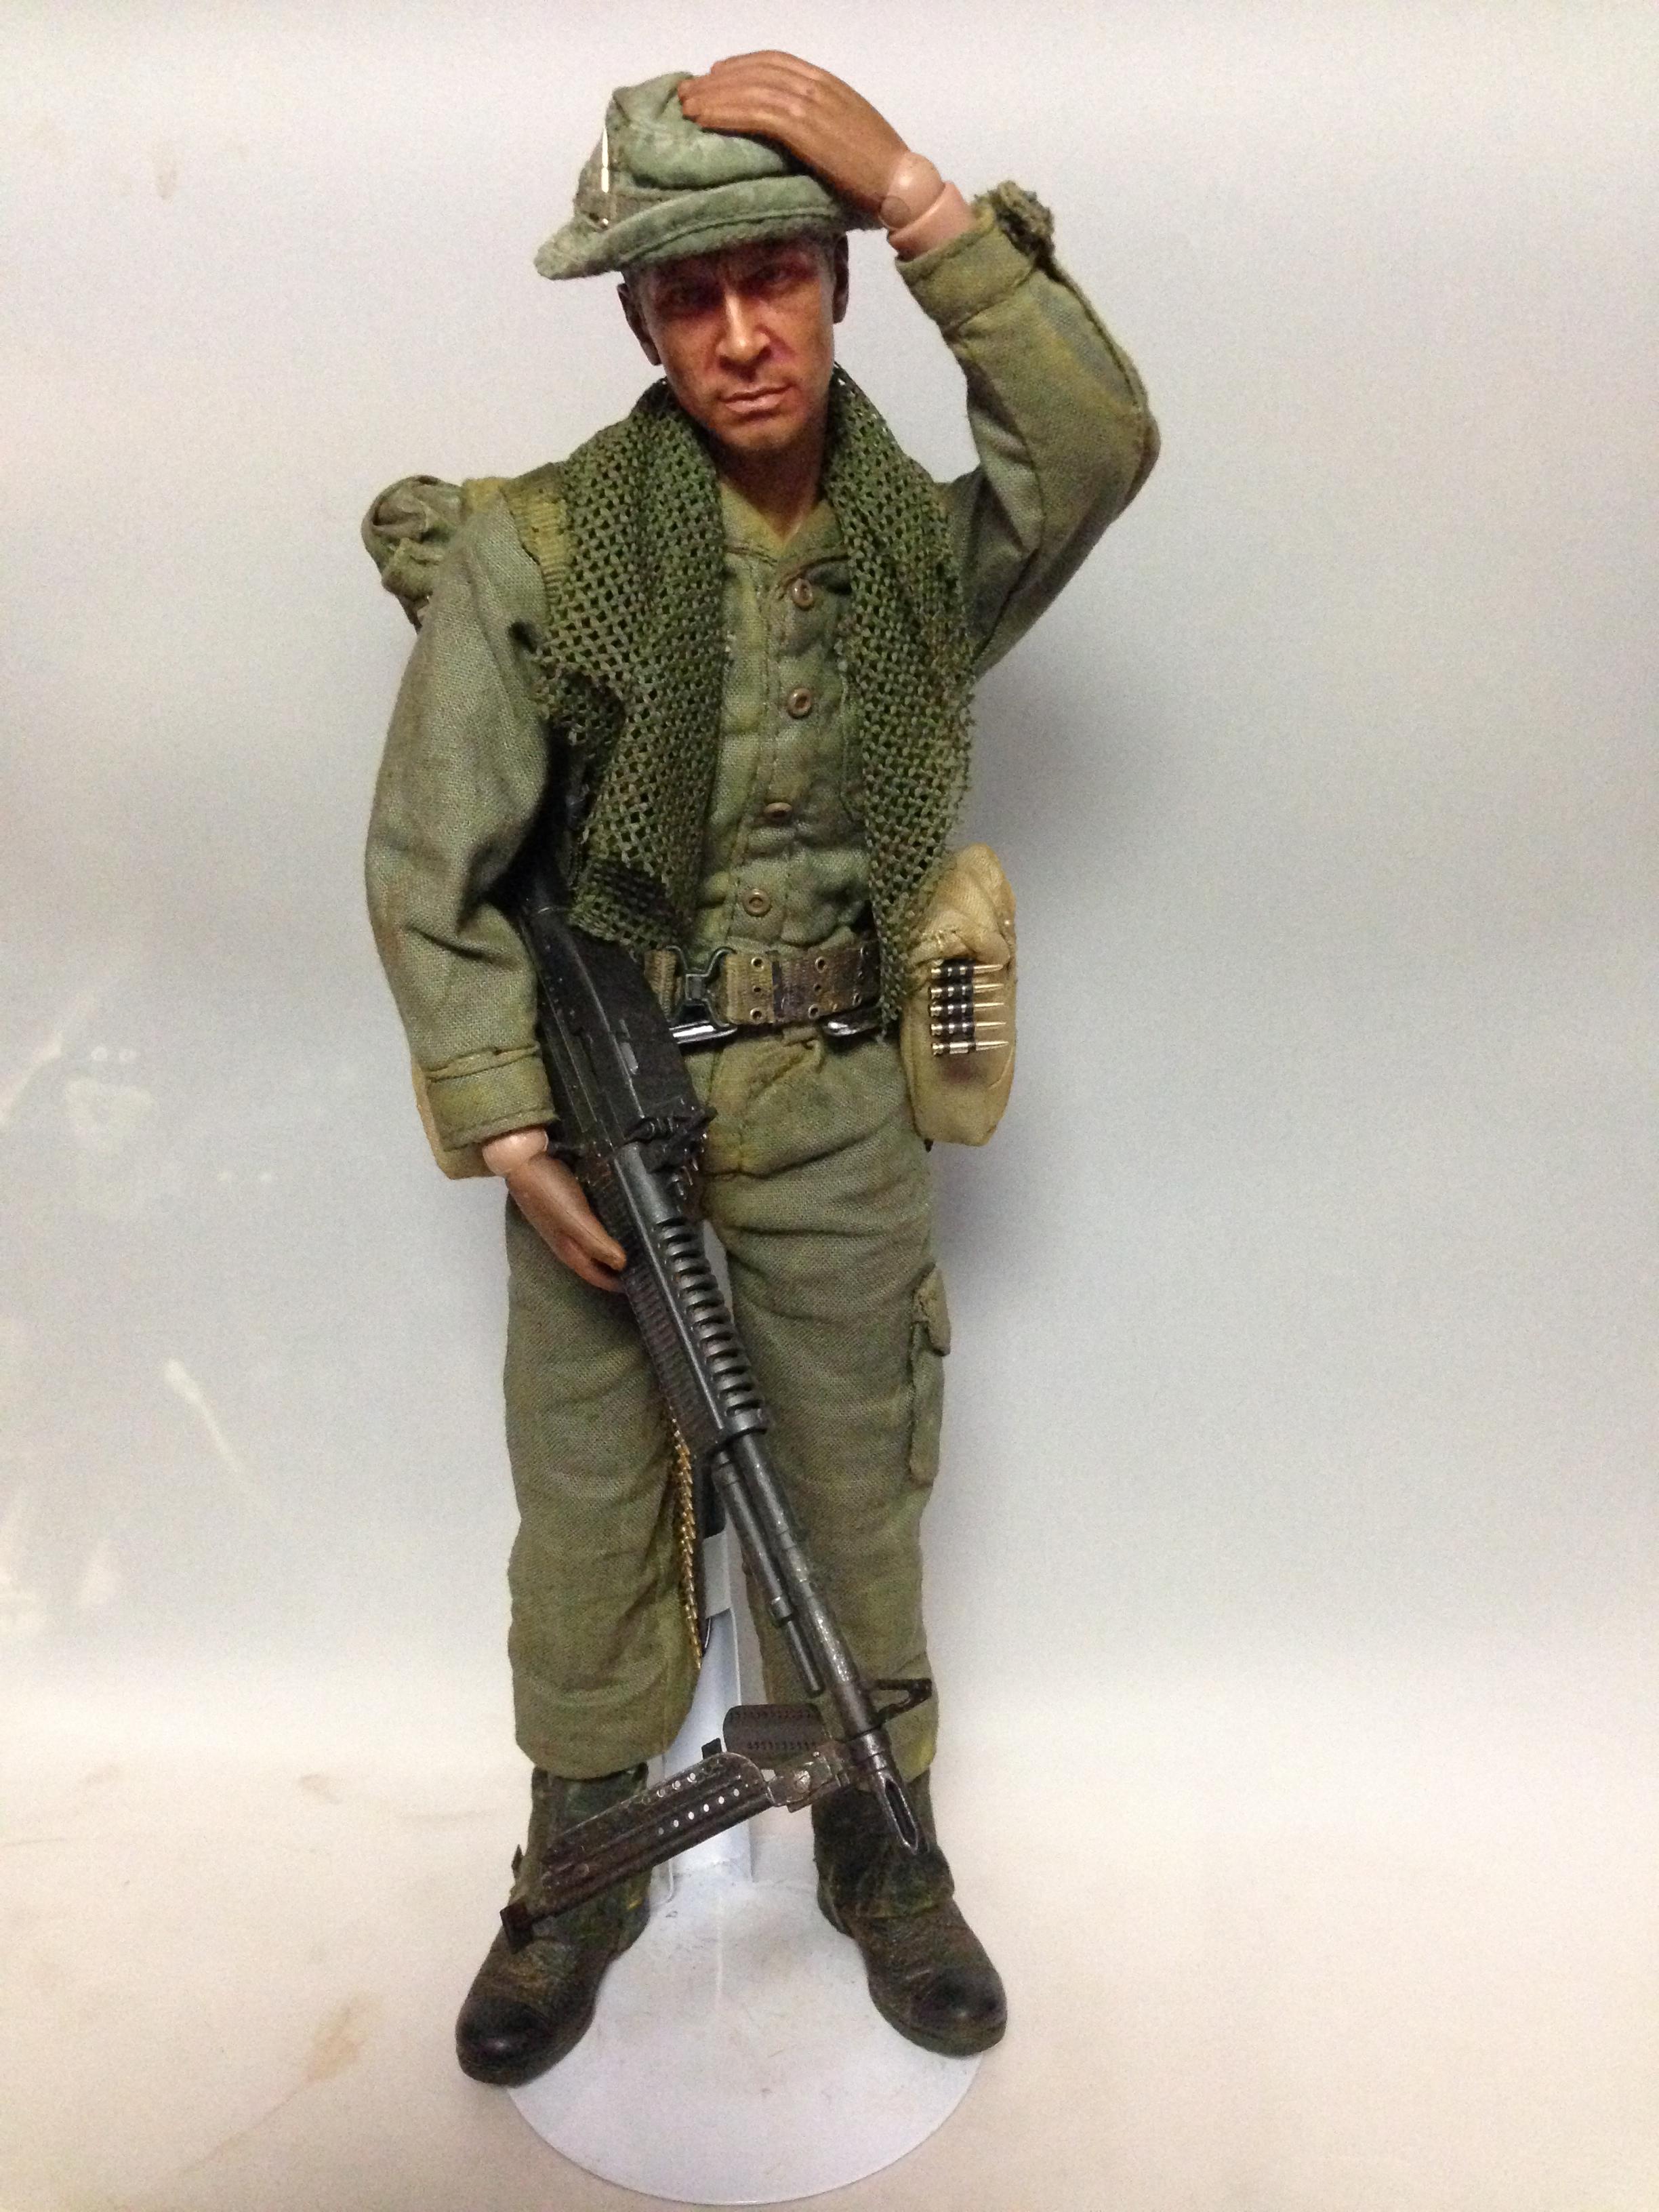 Cold War (Vietnam) Vietnam War Australian Figures/Uniforms?